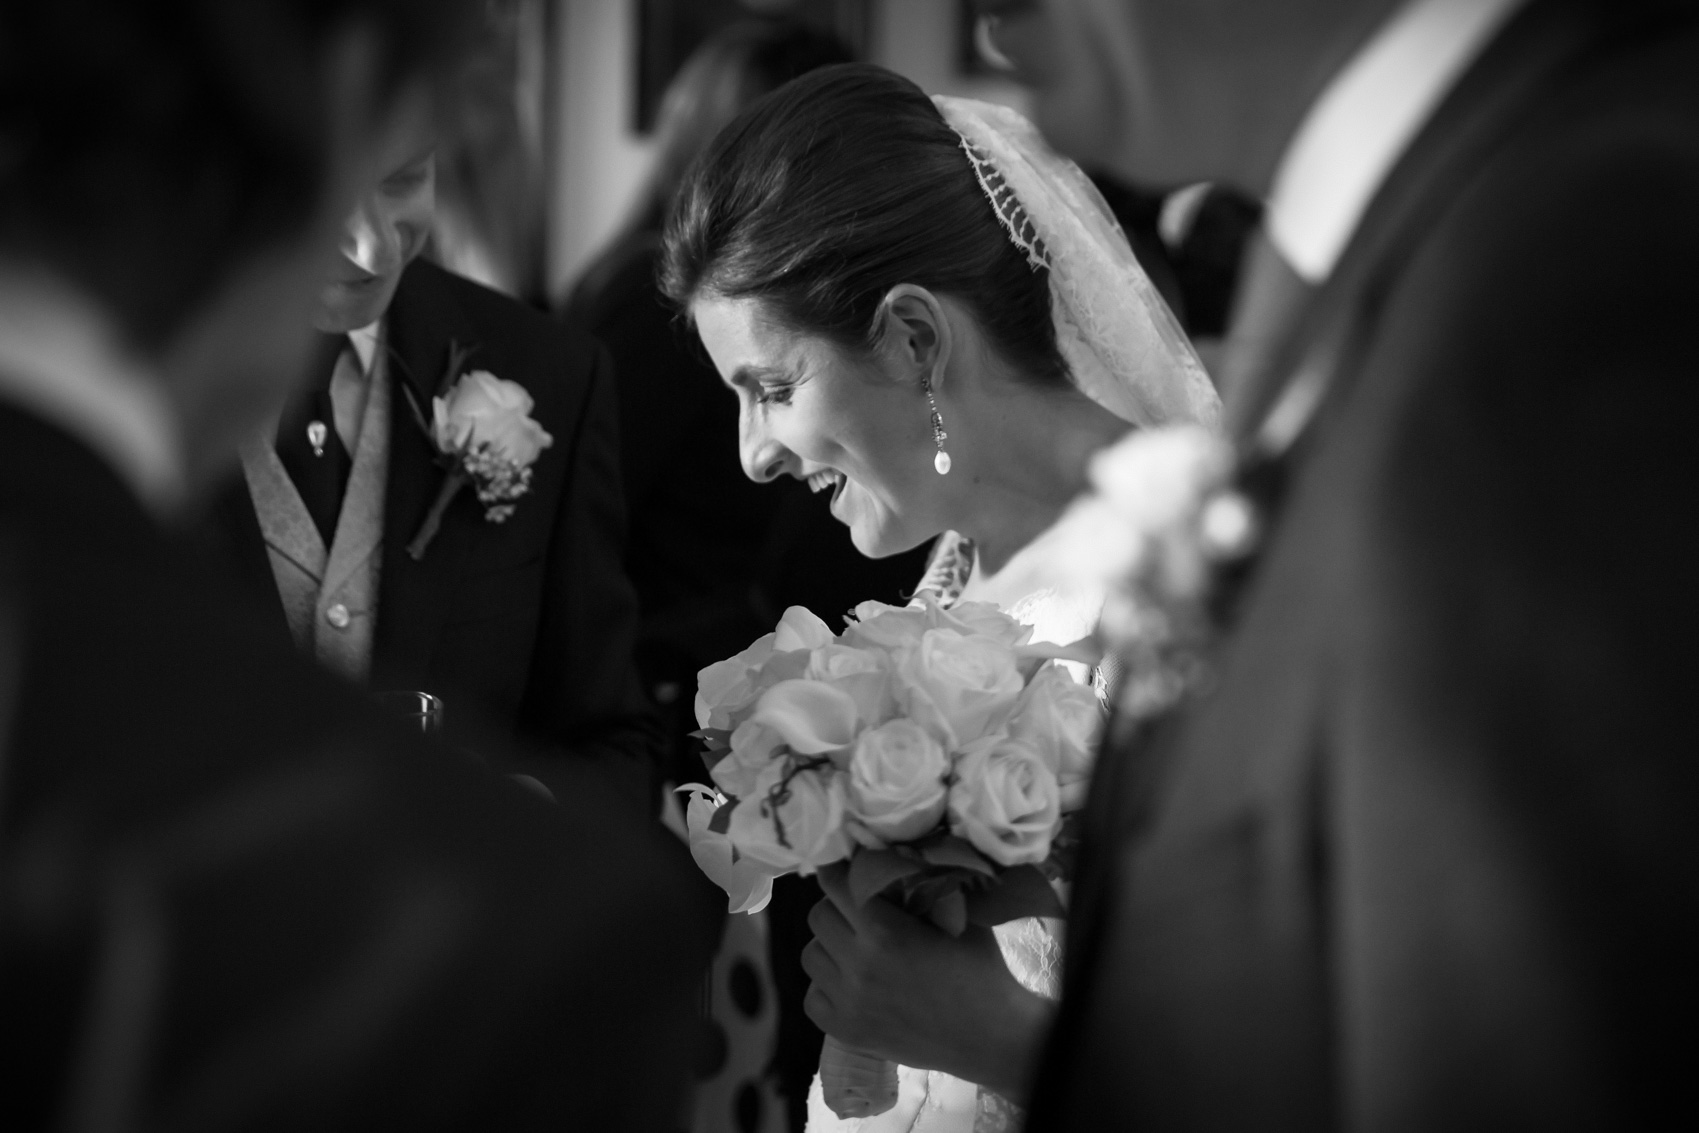 wedding-bride-black-and-white.jpg